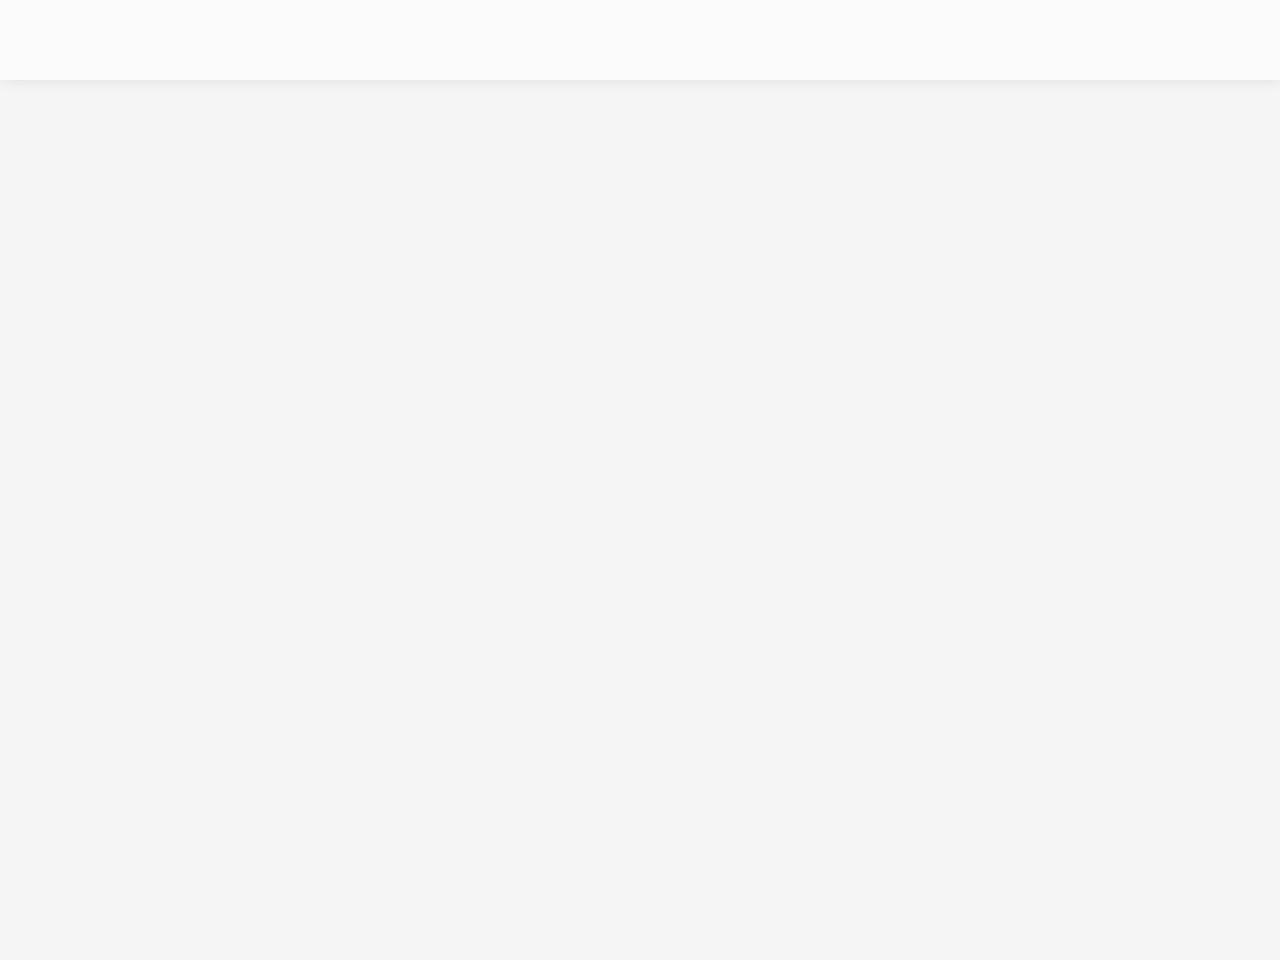 4PX递四方速递 For Perfect X-border